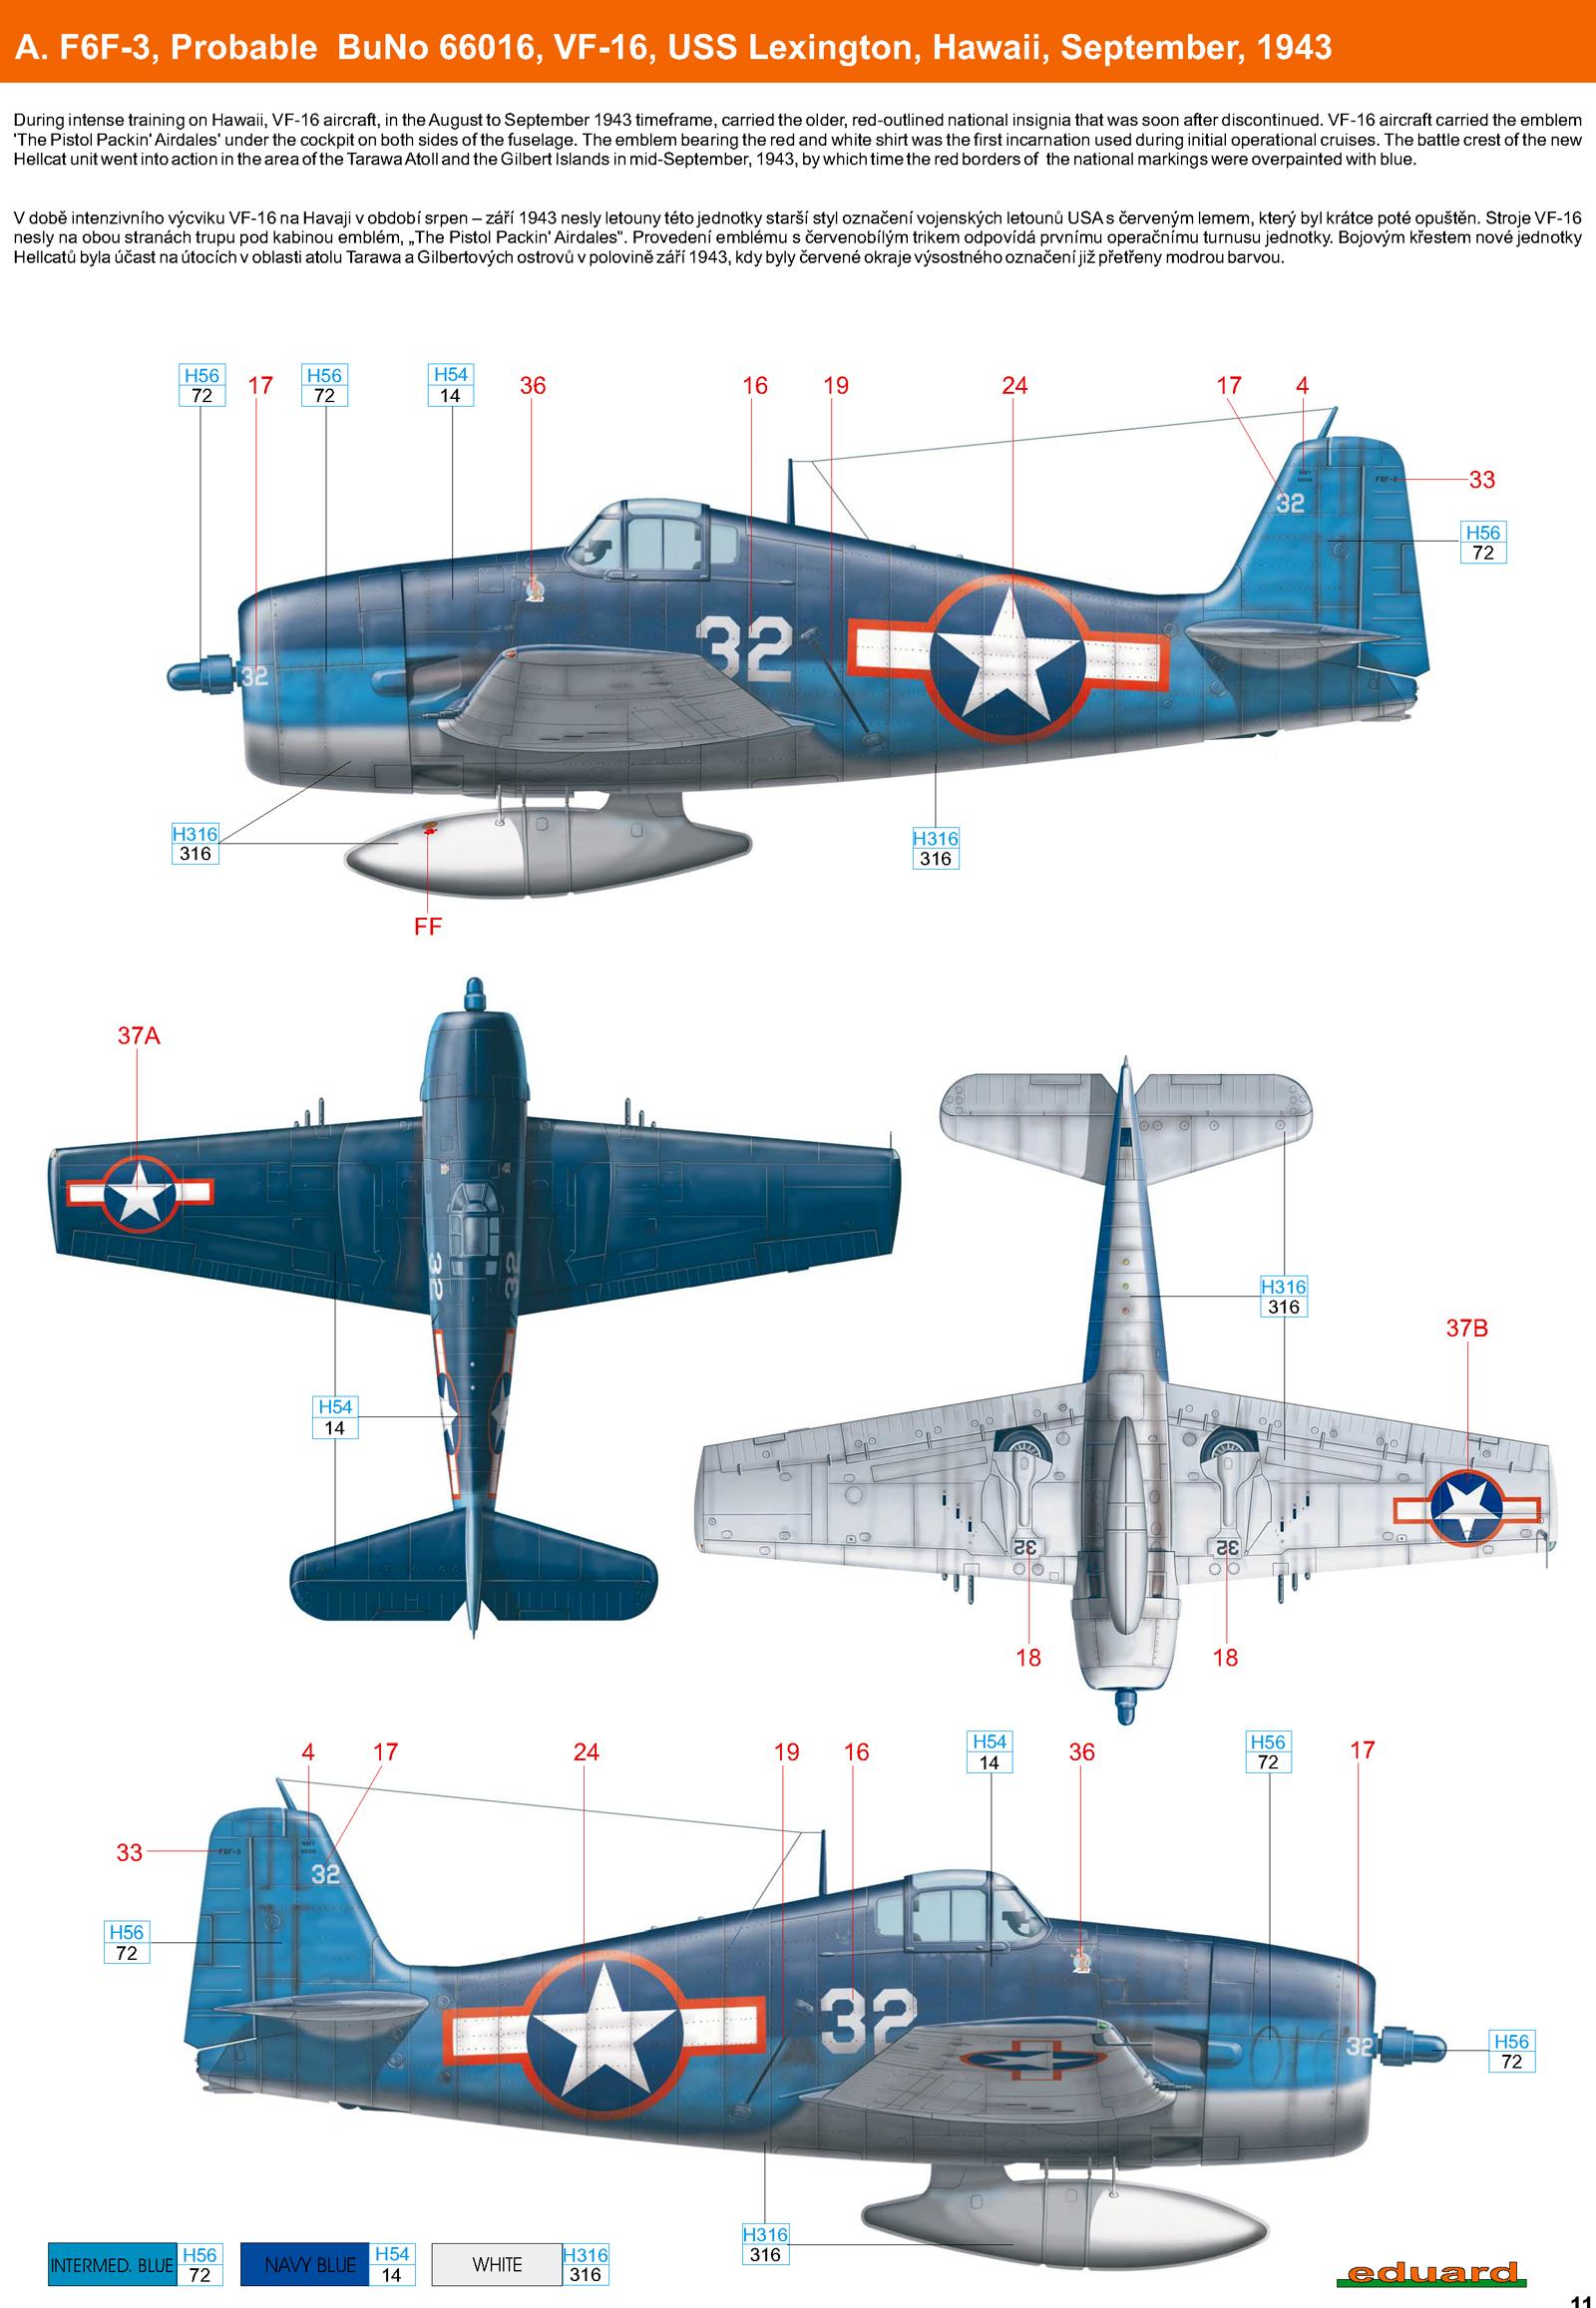 Grumman F6F 3 Hellcat VF 16 probable BuNo 66016 CV 16 USS Lexington Hawaii September 1943 0A